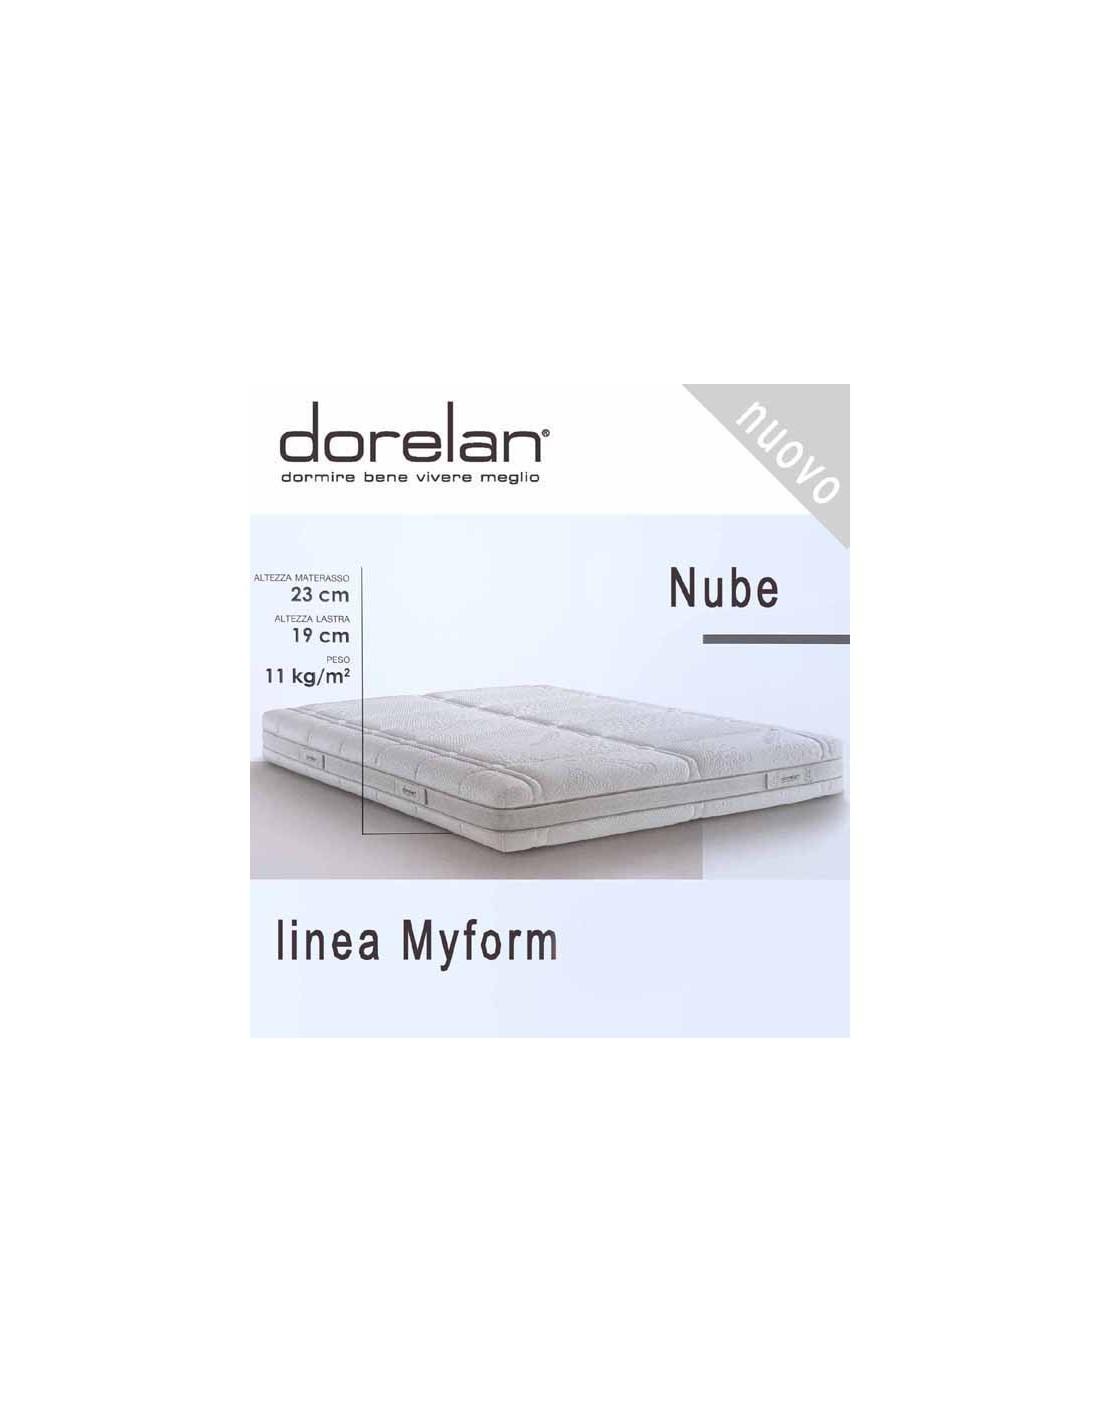 Dorelan Nube Myform Memory Clima Nuovo catalogo 2019